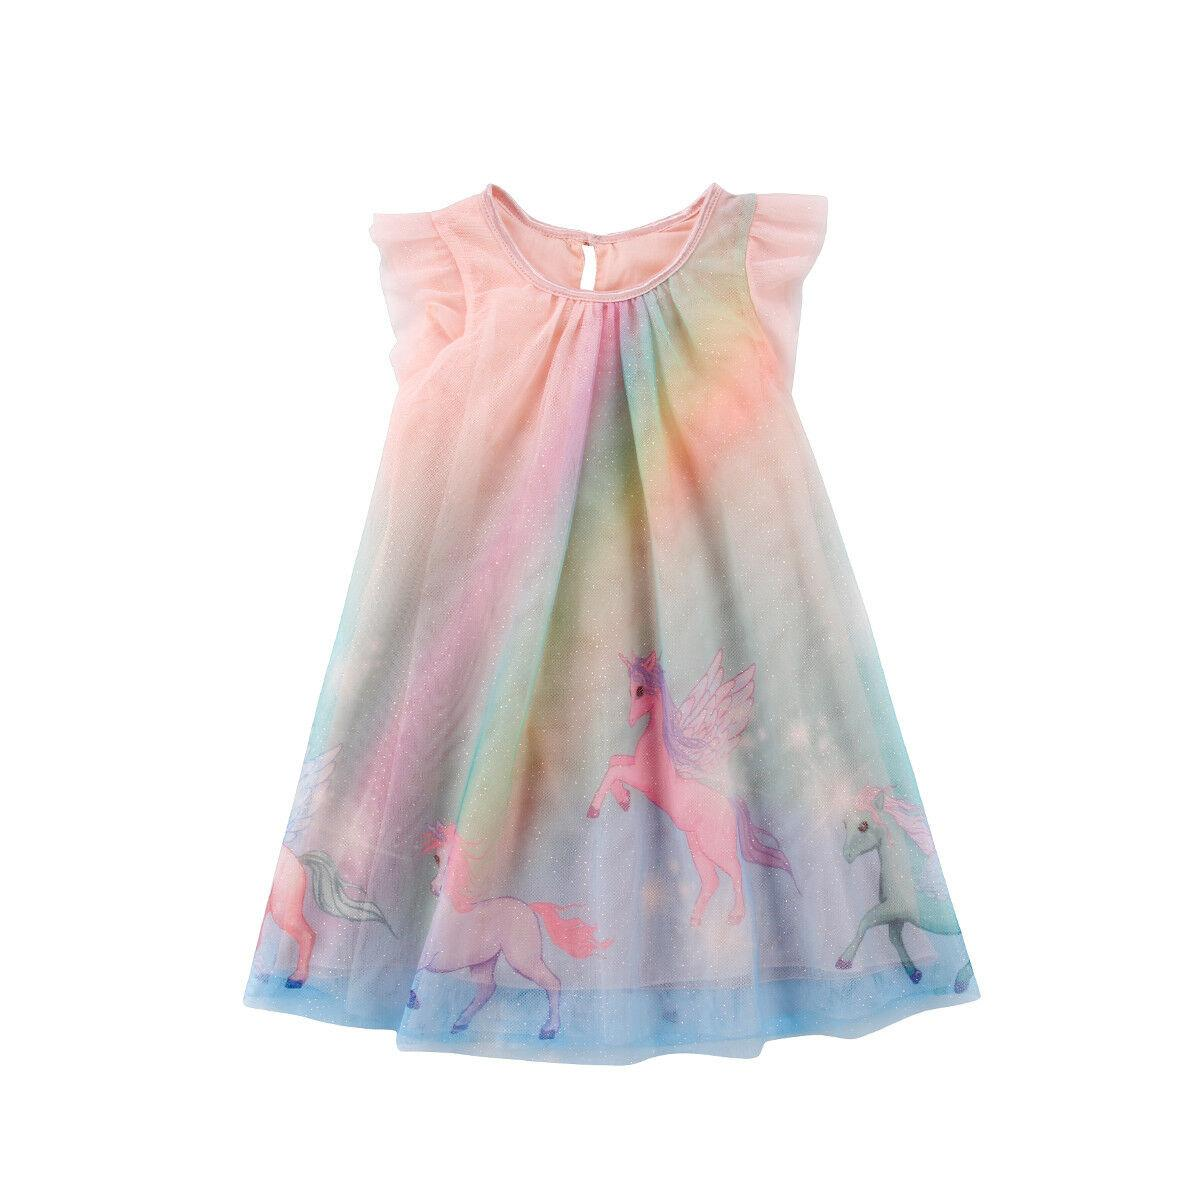 Roupa do vestido da menina vestido de tule Tutu partido do bebê Vestido de Verão de Verão